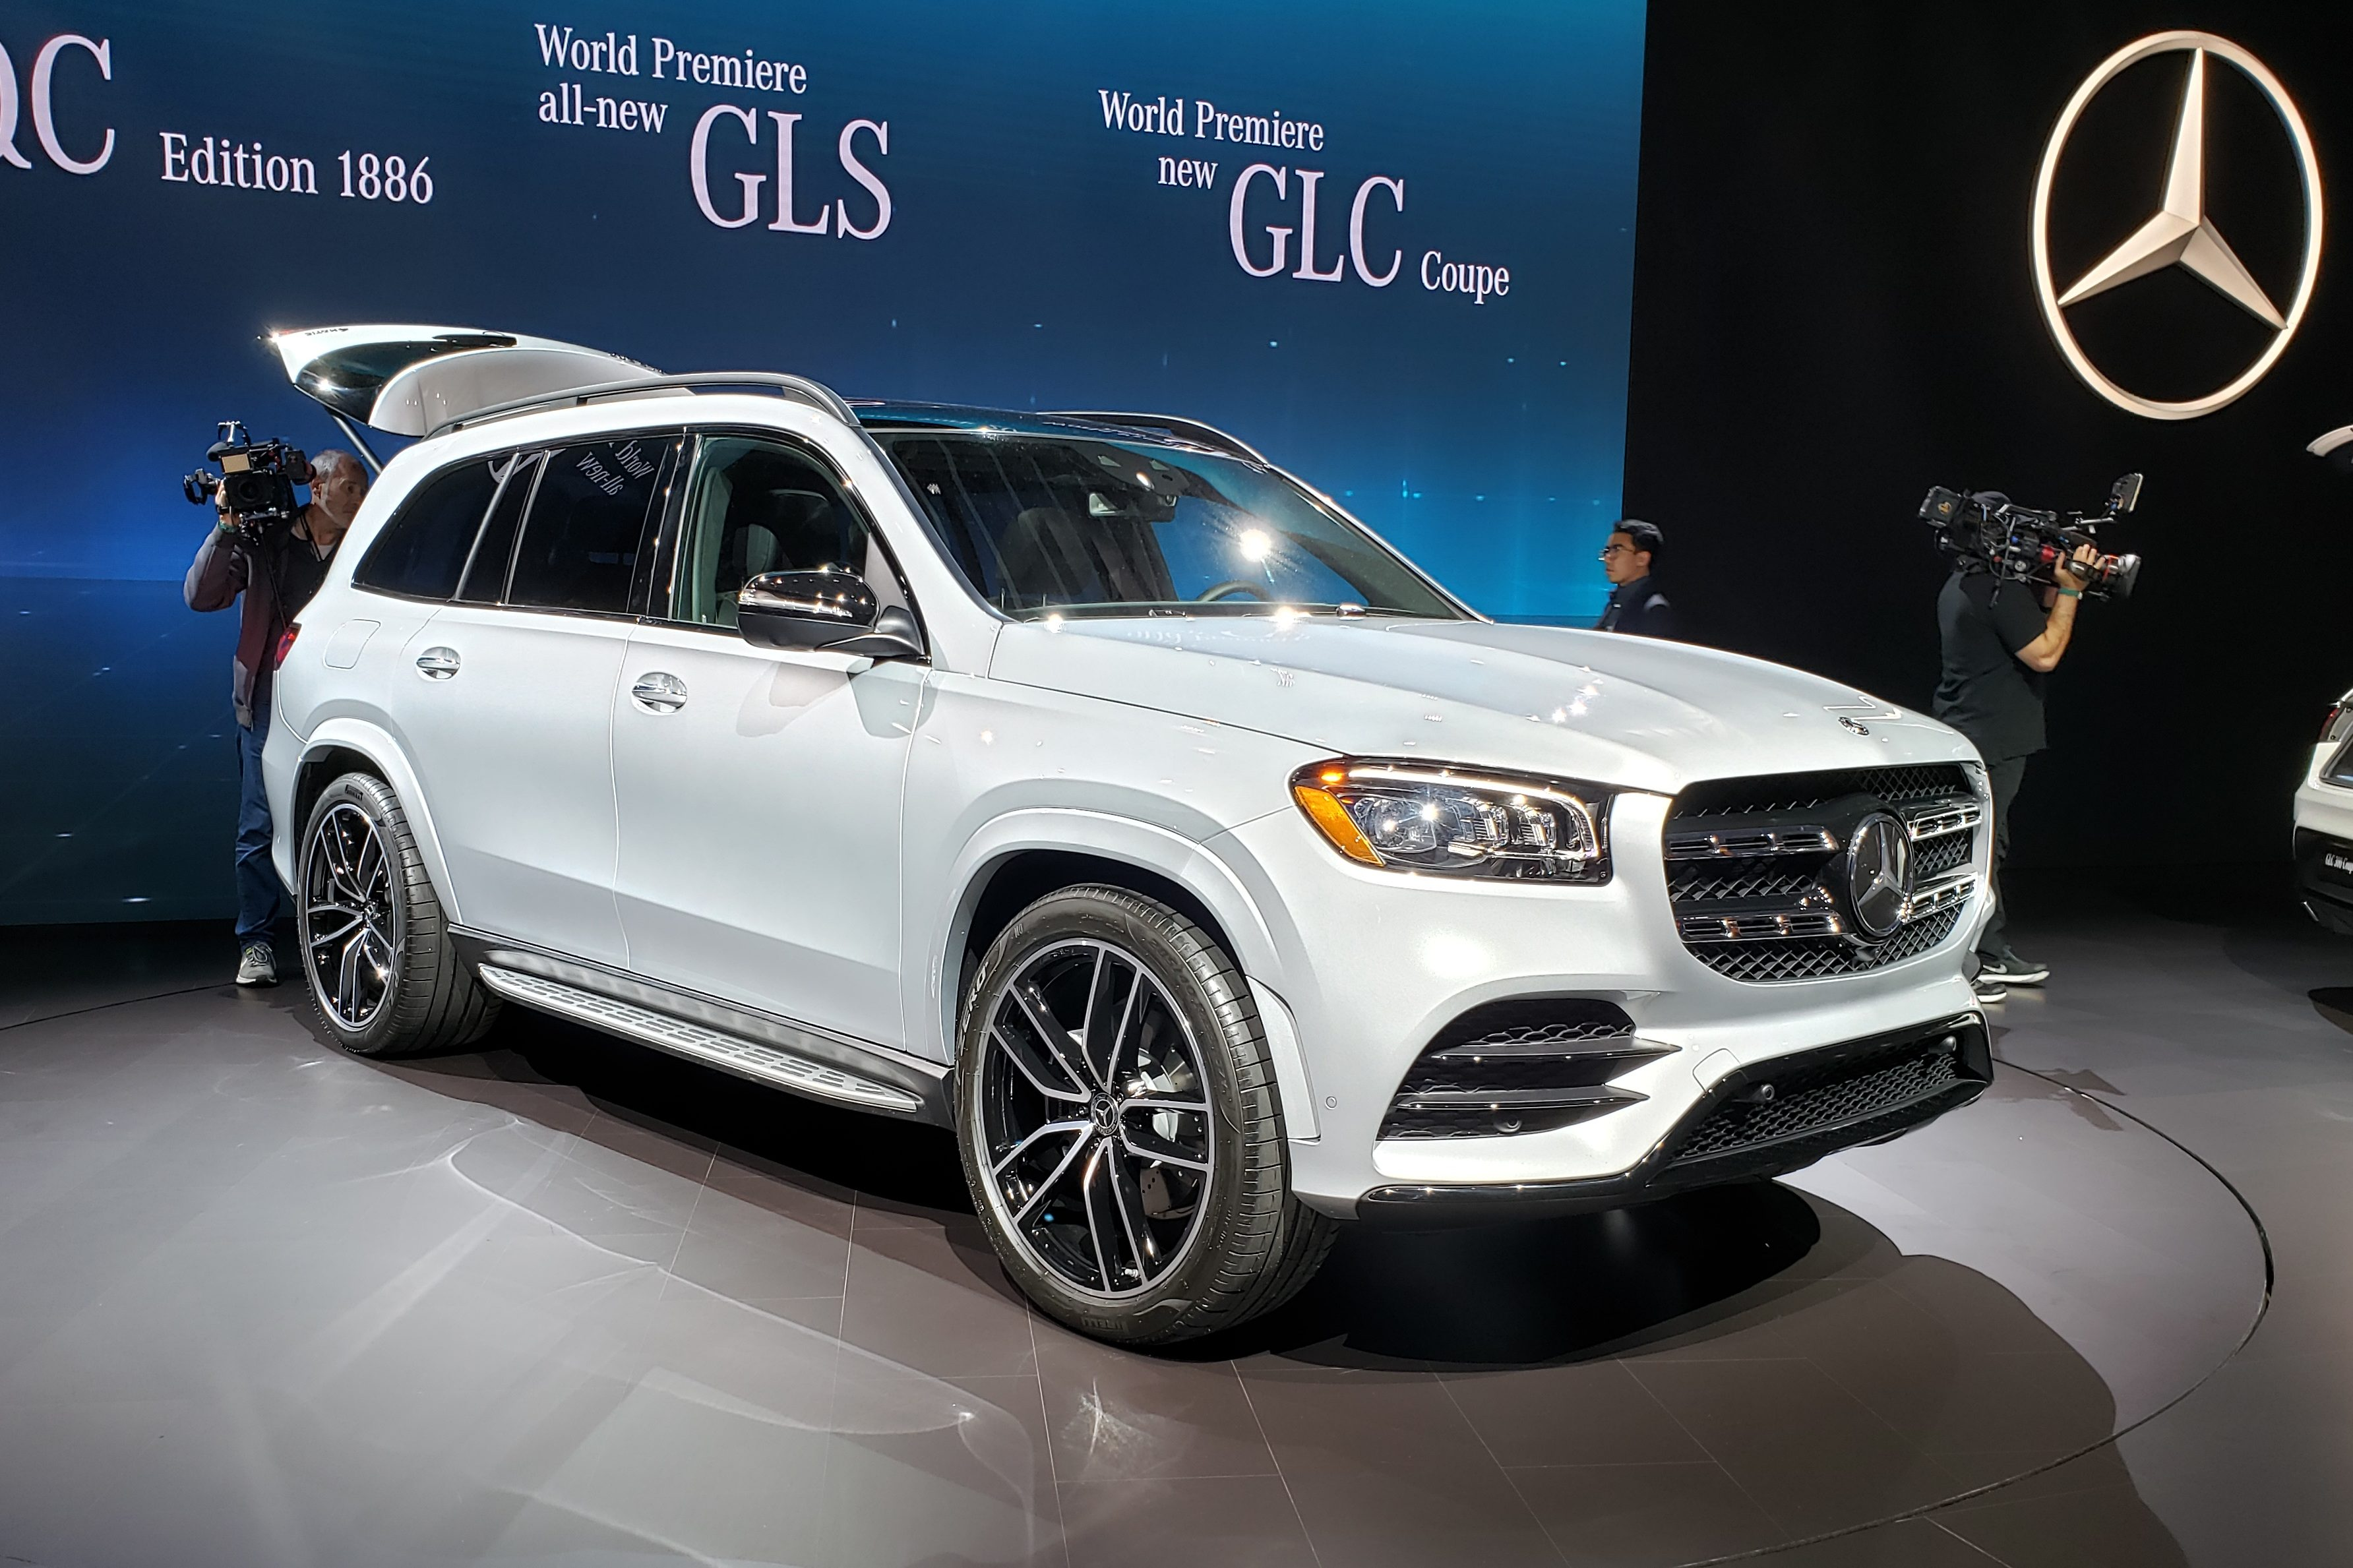 Mercedes Gls Ultratecnologico Suv Gigante Tem Ate Modo Lava A Jato Quatro Rodas